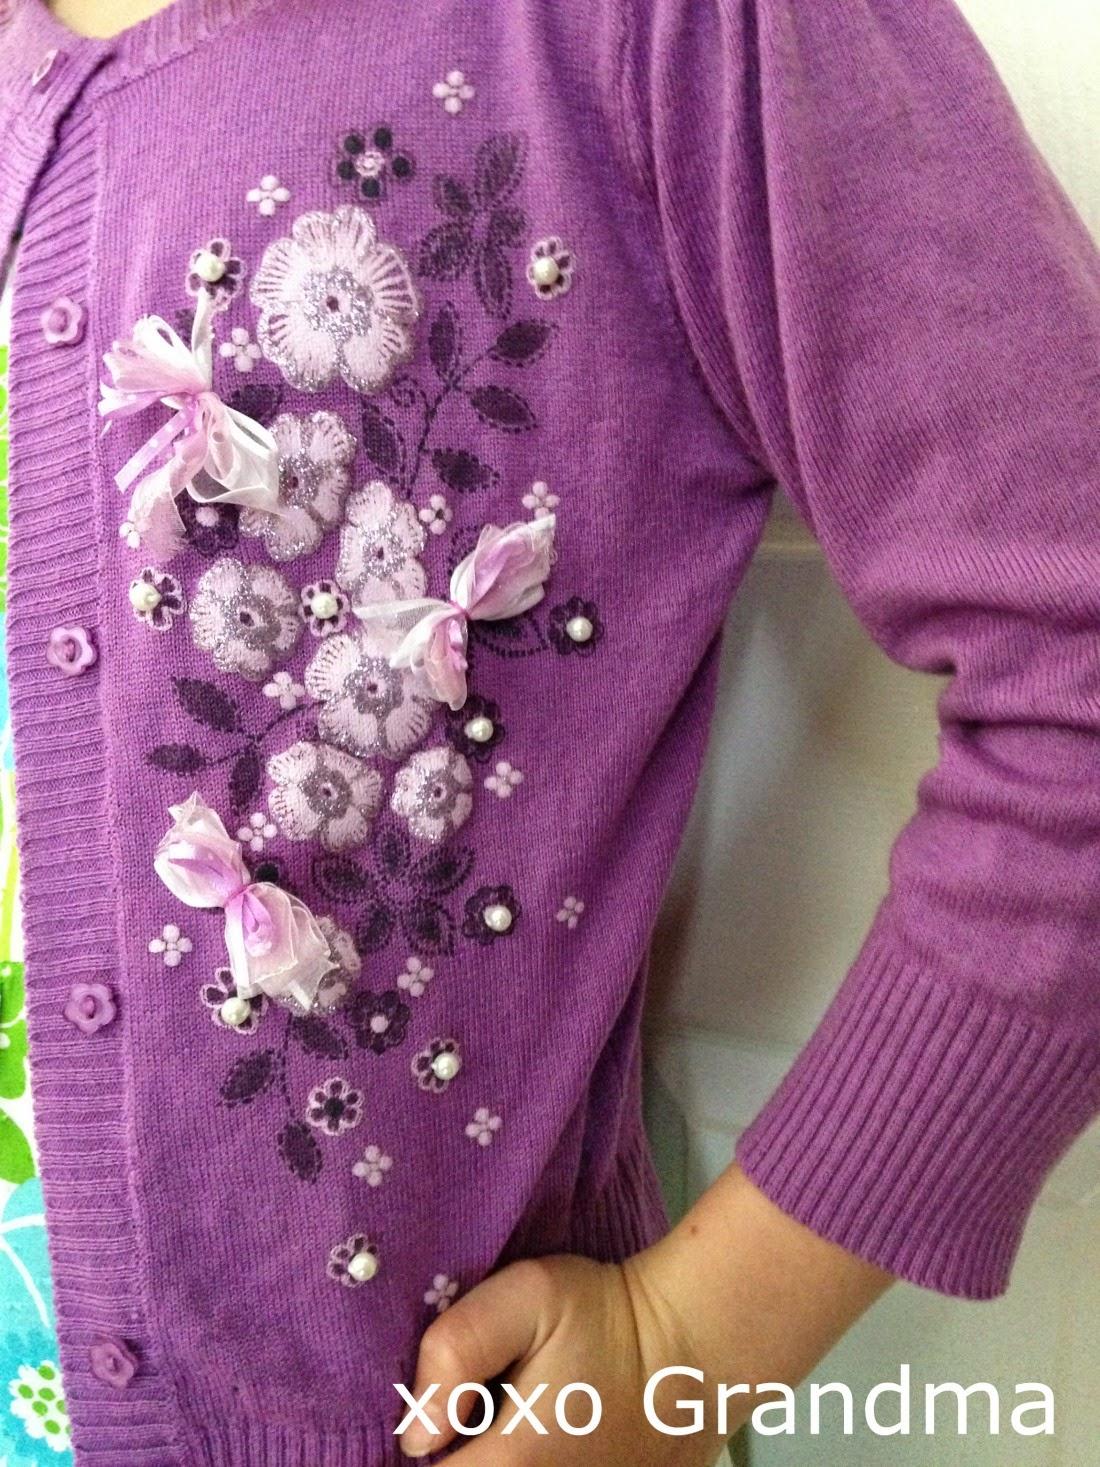 http://xoxograndma.blogspot.com/2015/01/glamorize-sweater-tutorial.html